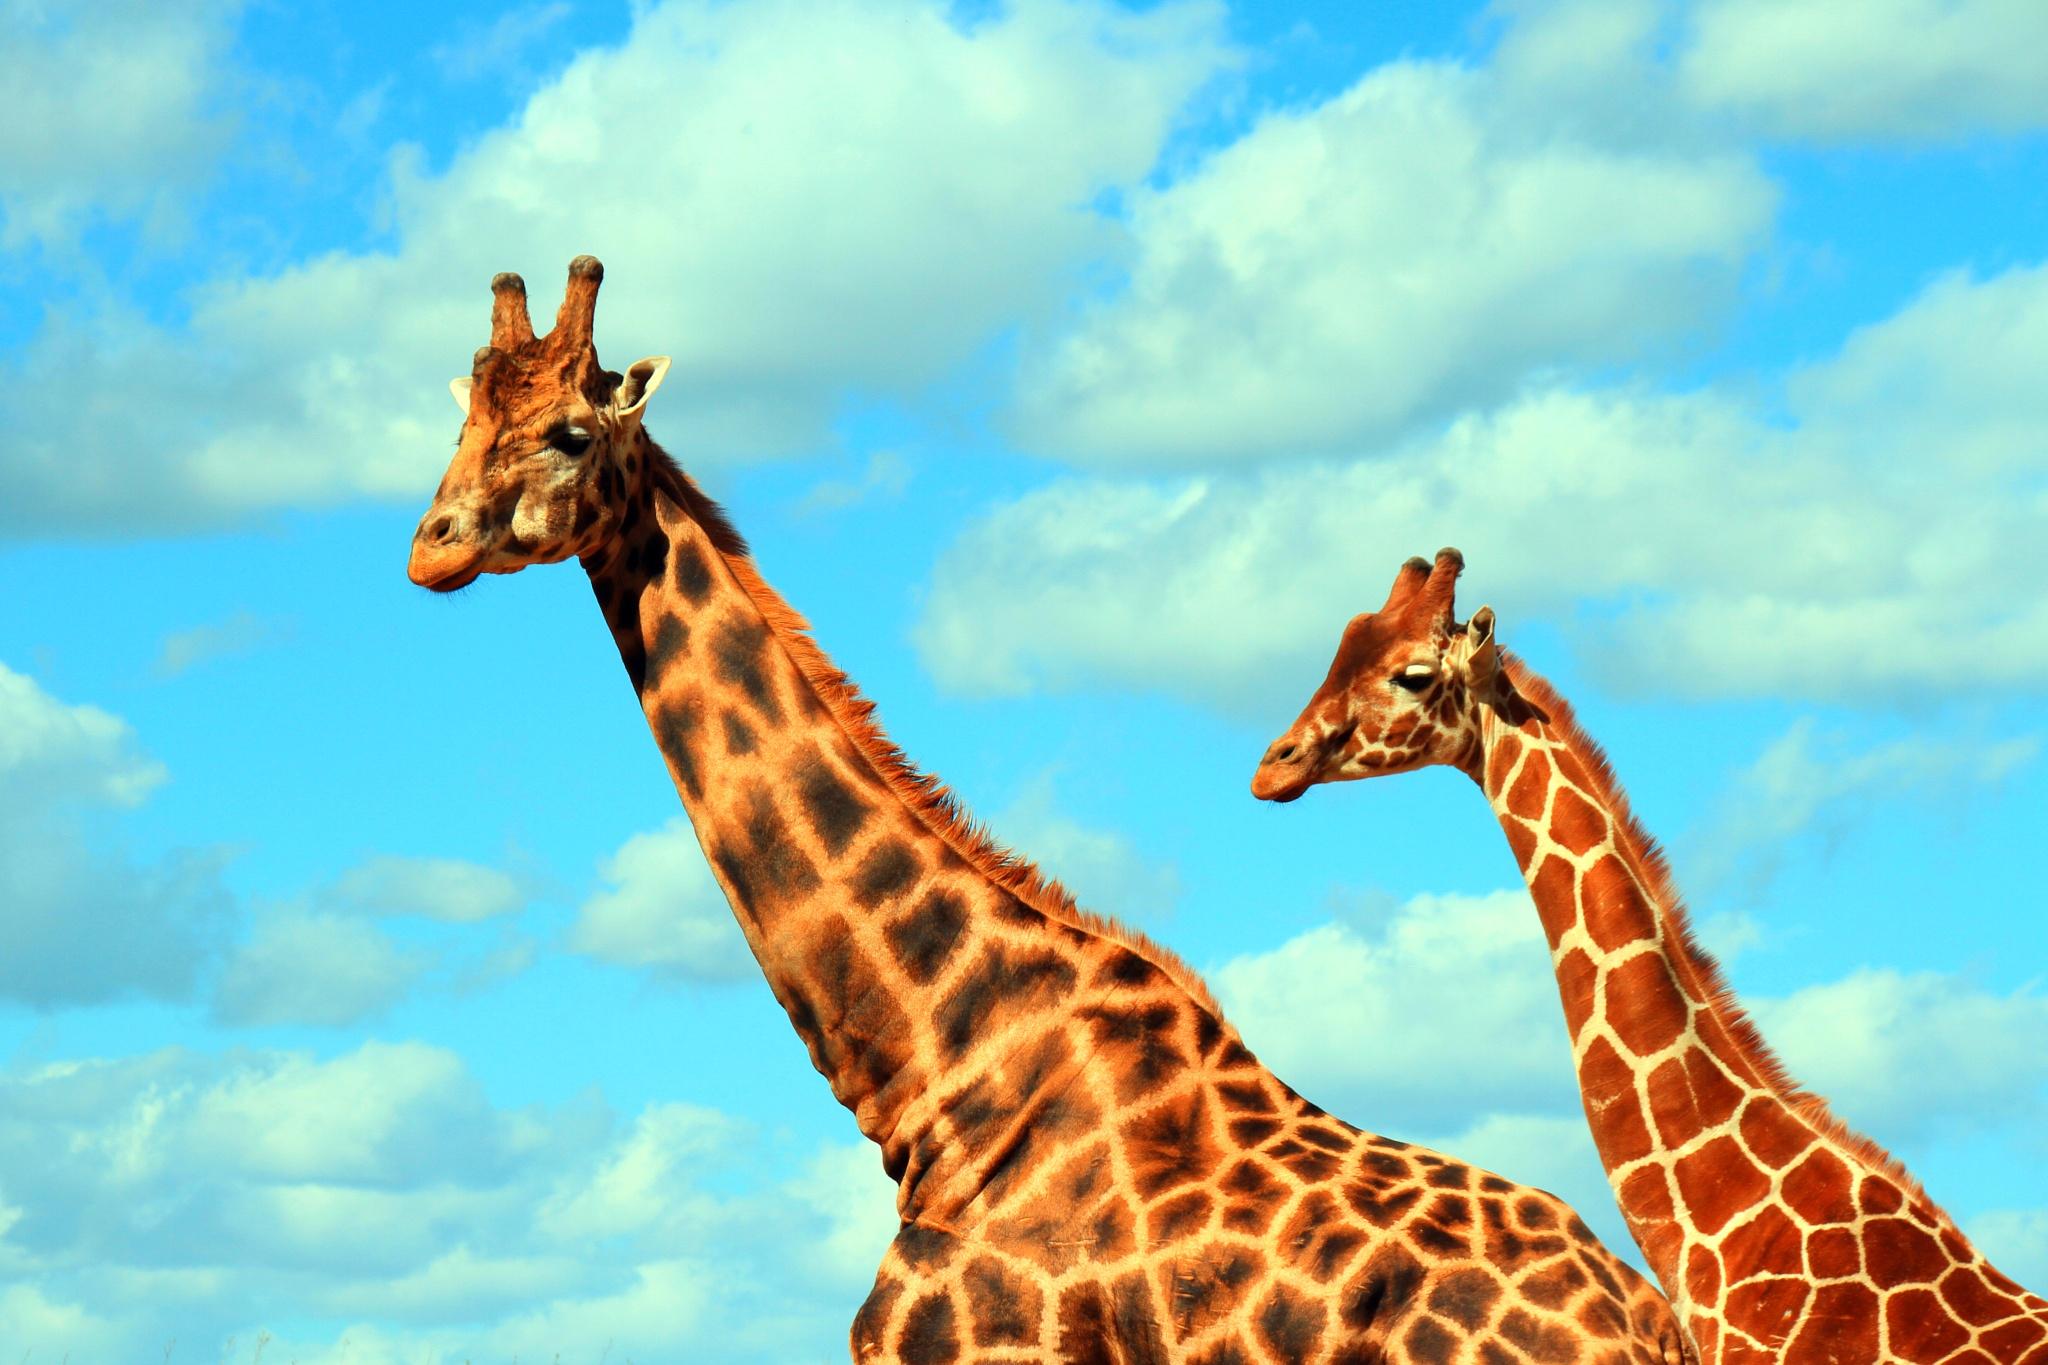 Two Giraffe's by Martin Roper